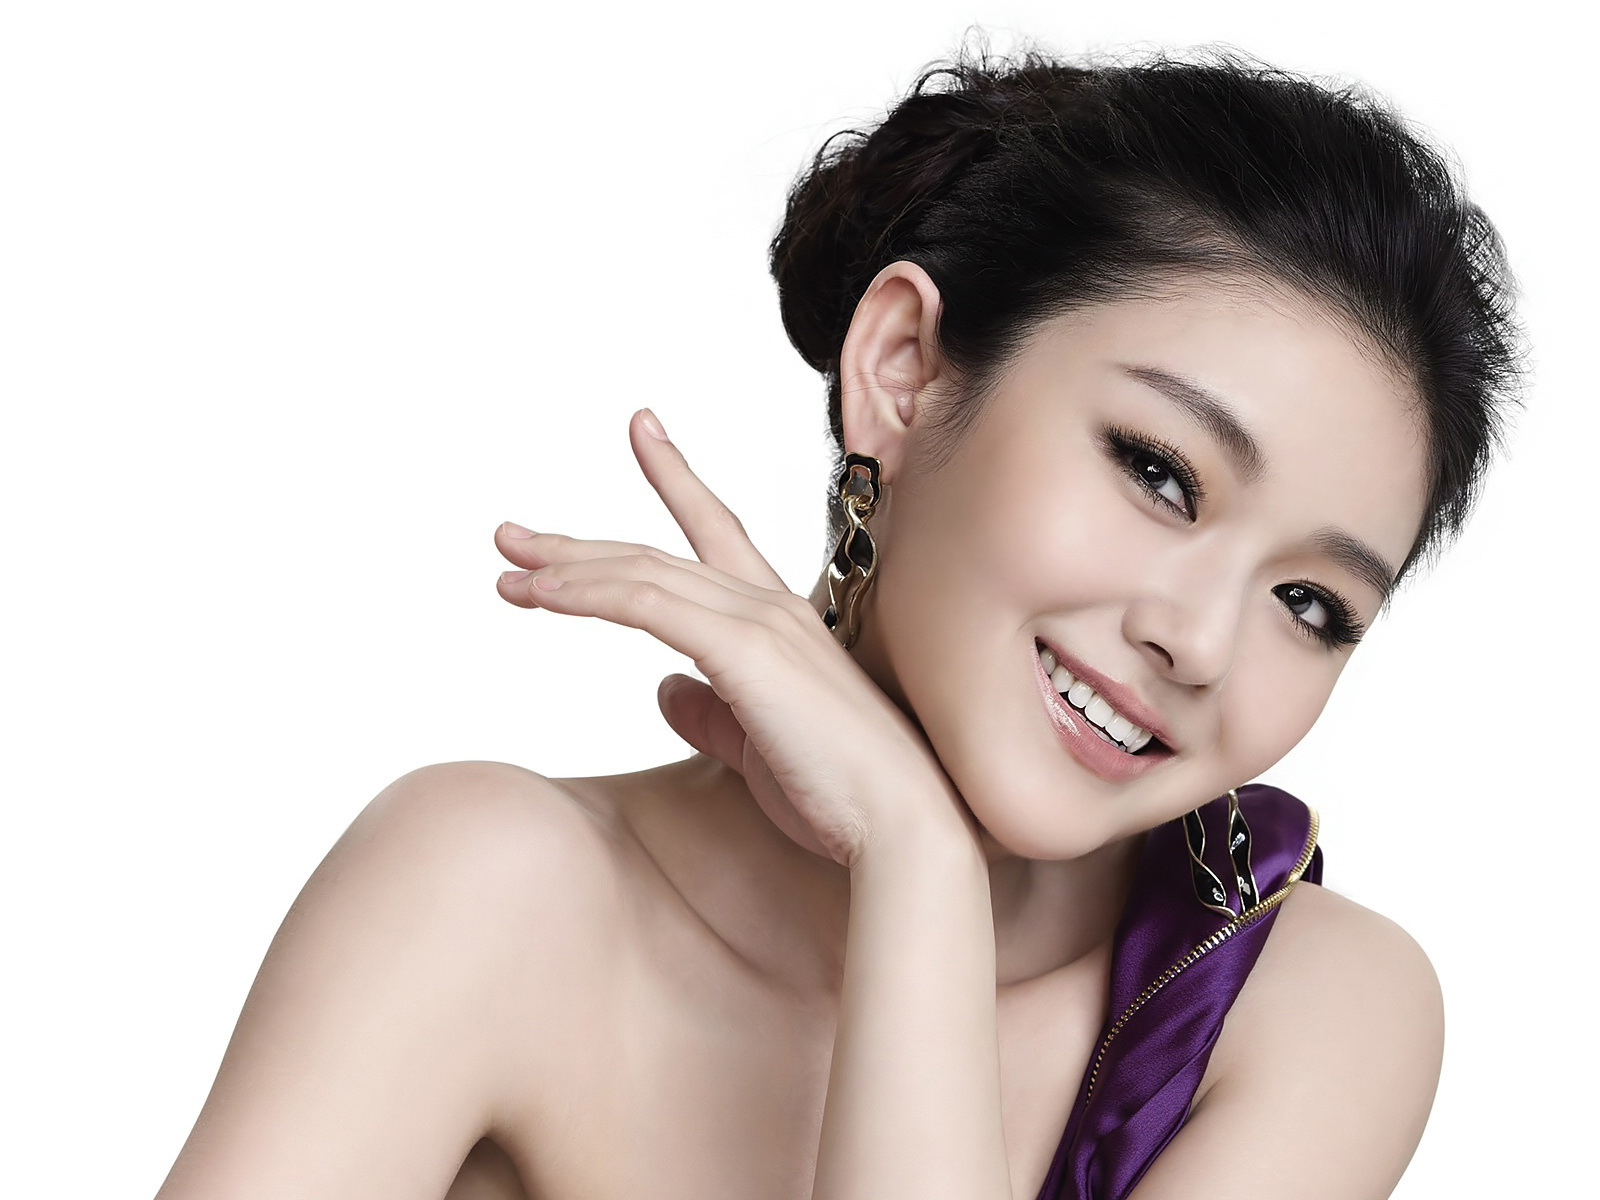 Cute And Beautiful Girls Wallpaper Pack 13 Cute Girls Celebrity 1600x1200